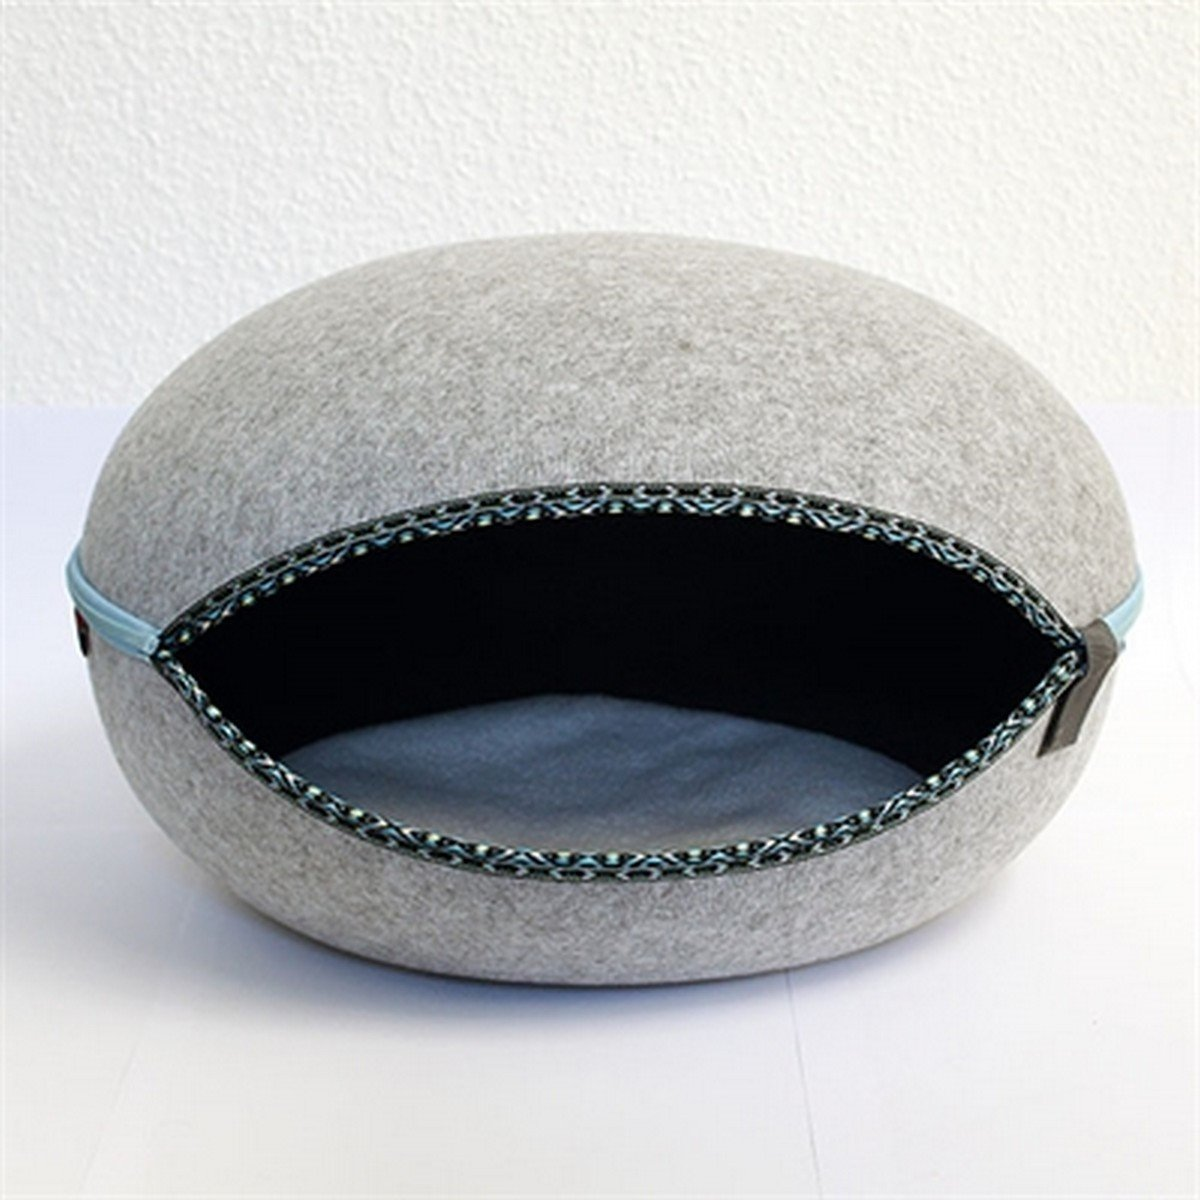 Image of CanadianCat Company Cat Basket Cocon Grey 52X45X33cm